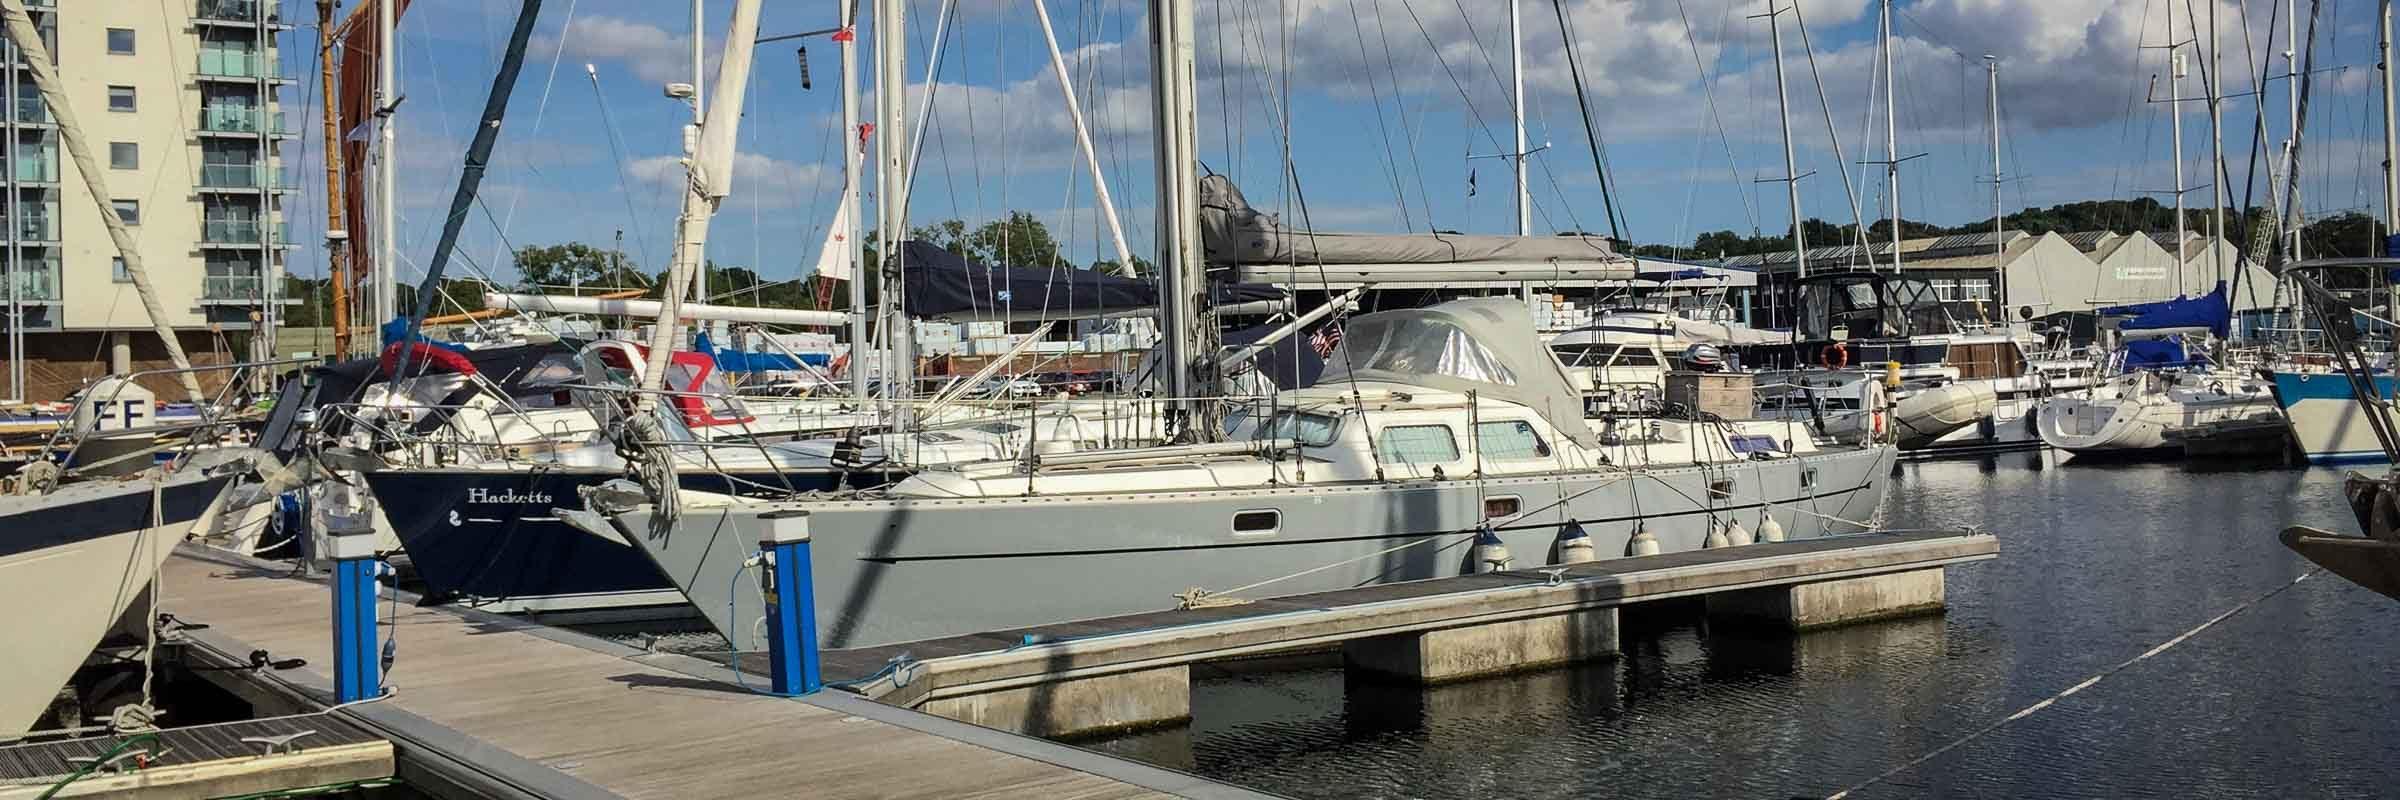 Oyster 435 yacht in Ipswich marina